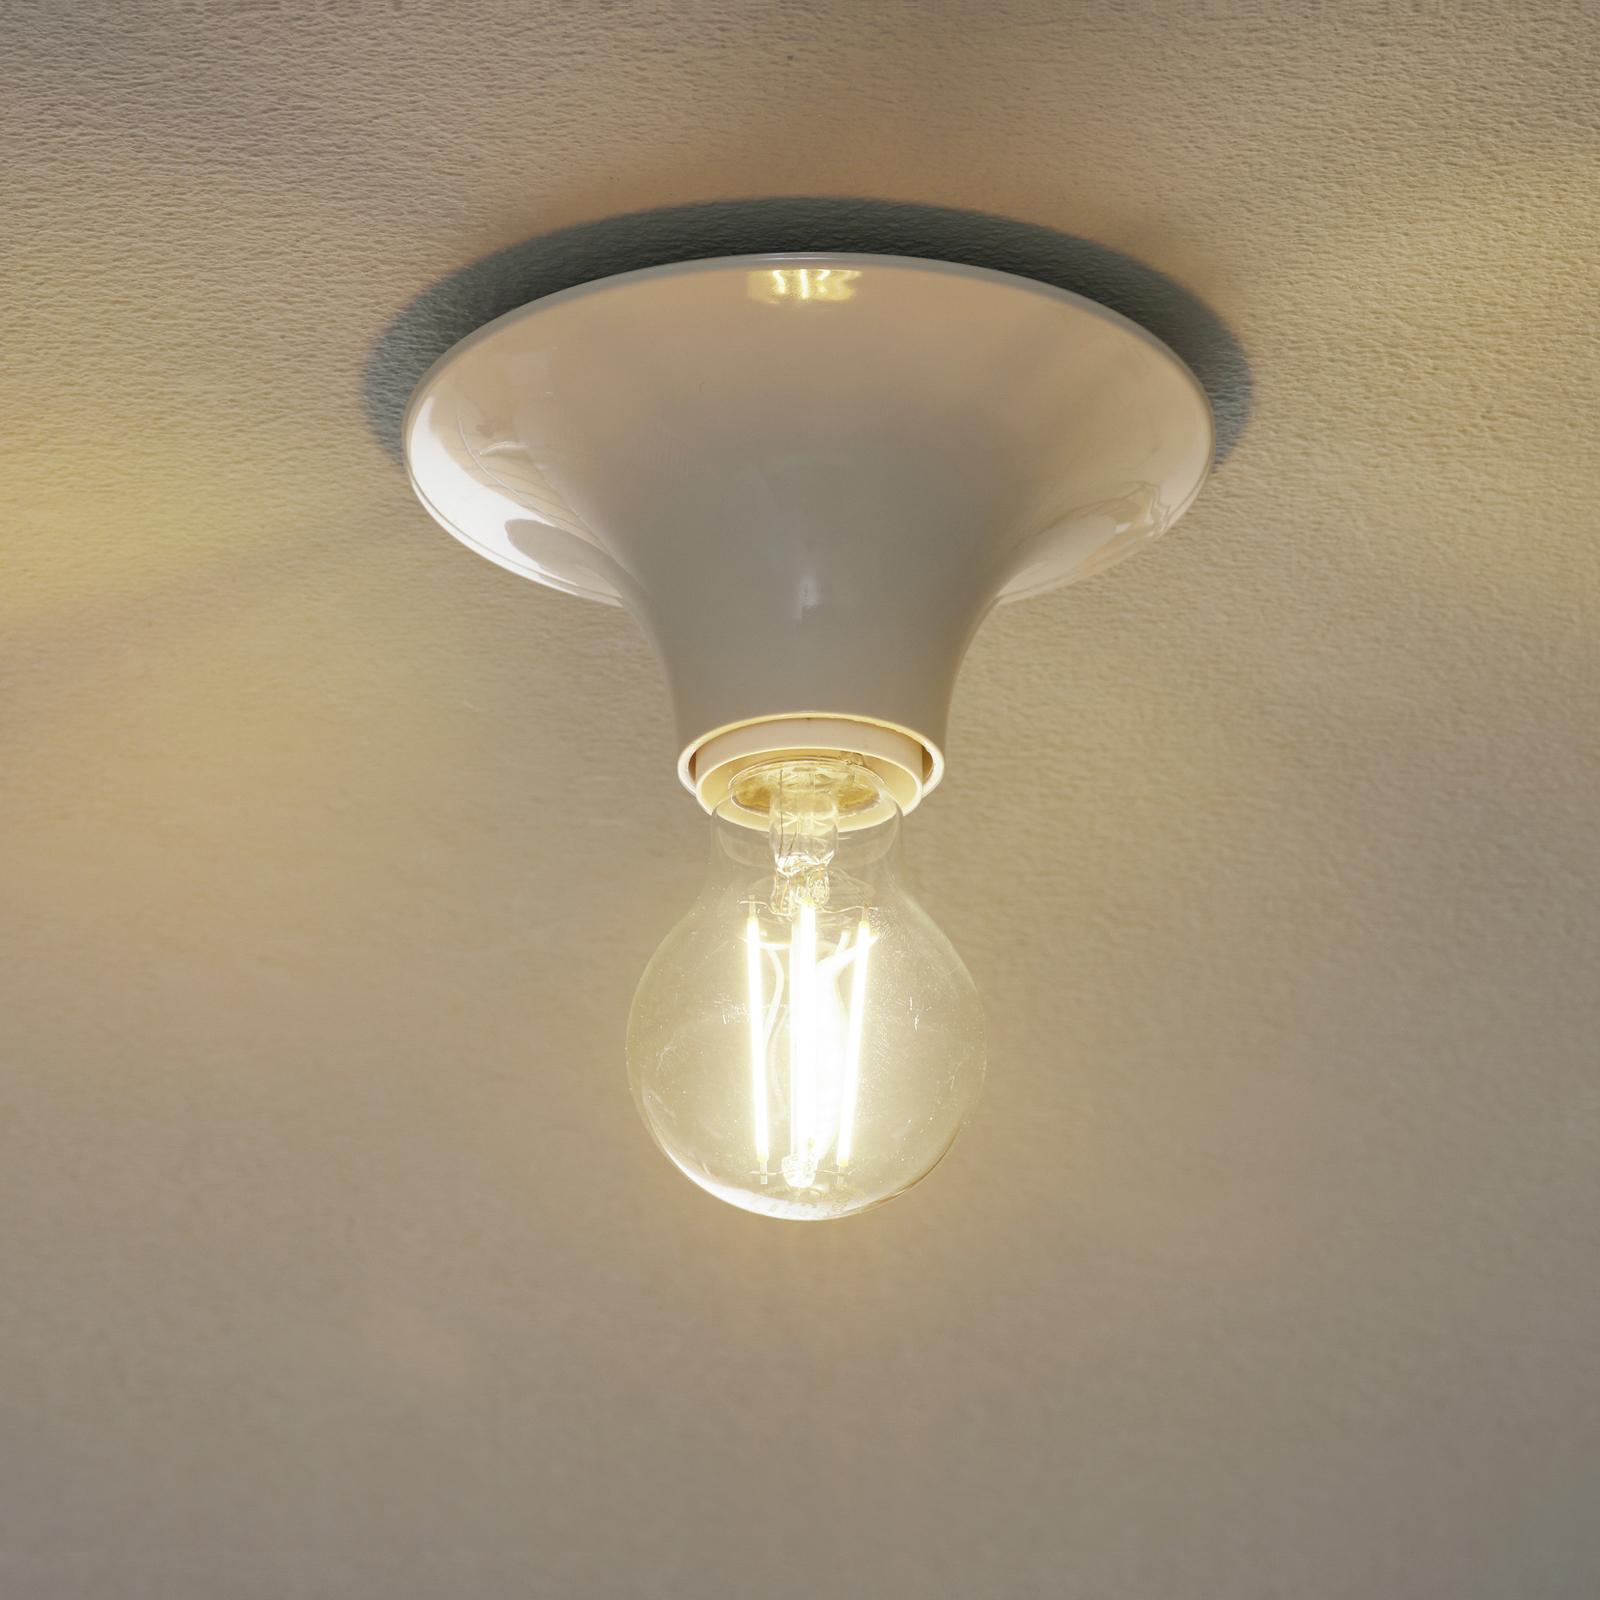 Artemide Teti designer-loftlampe, hvid